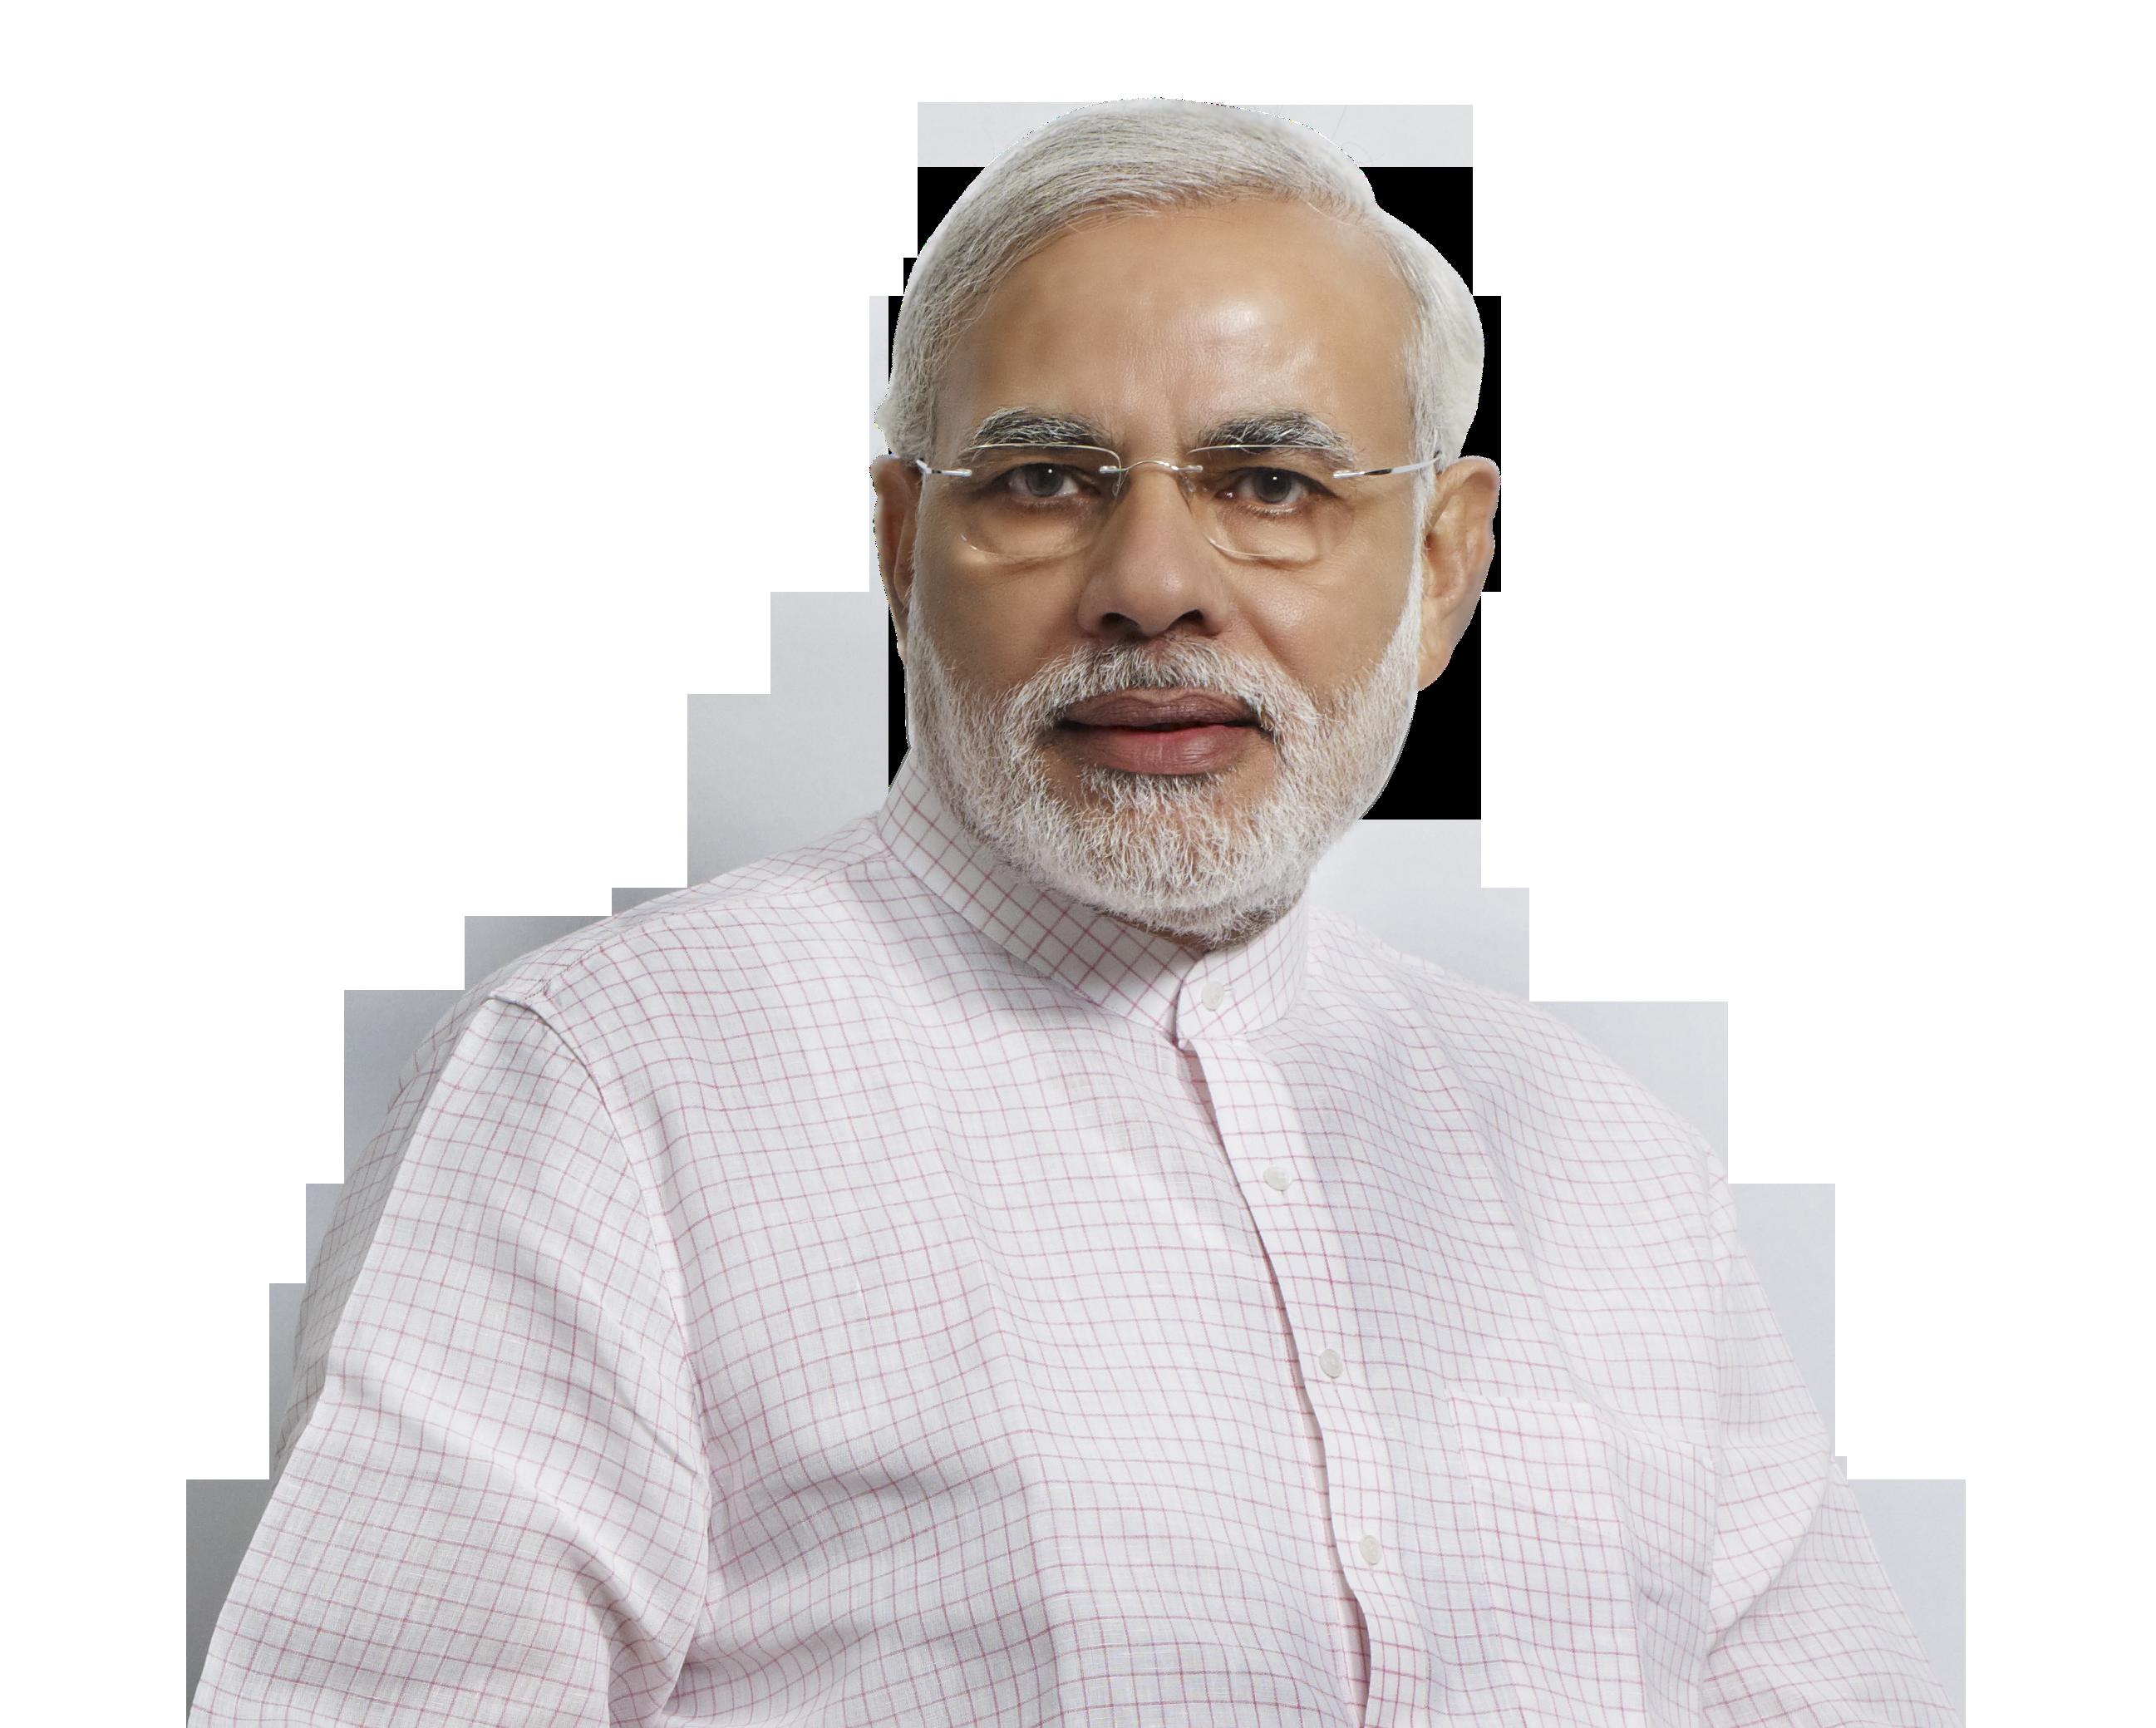 narendra-modi - Narendra Modi PNG